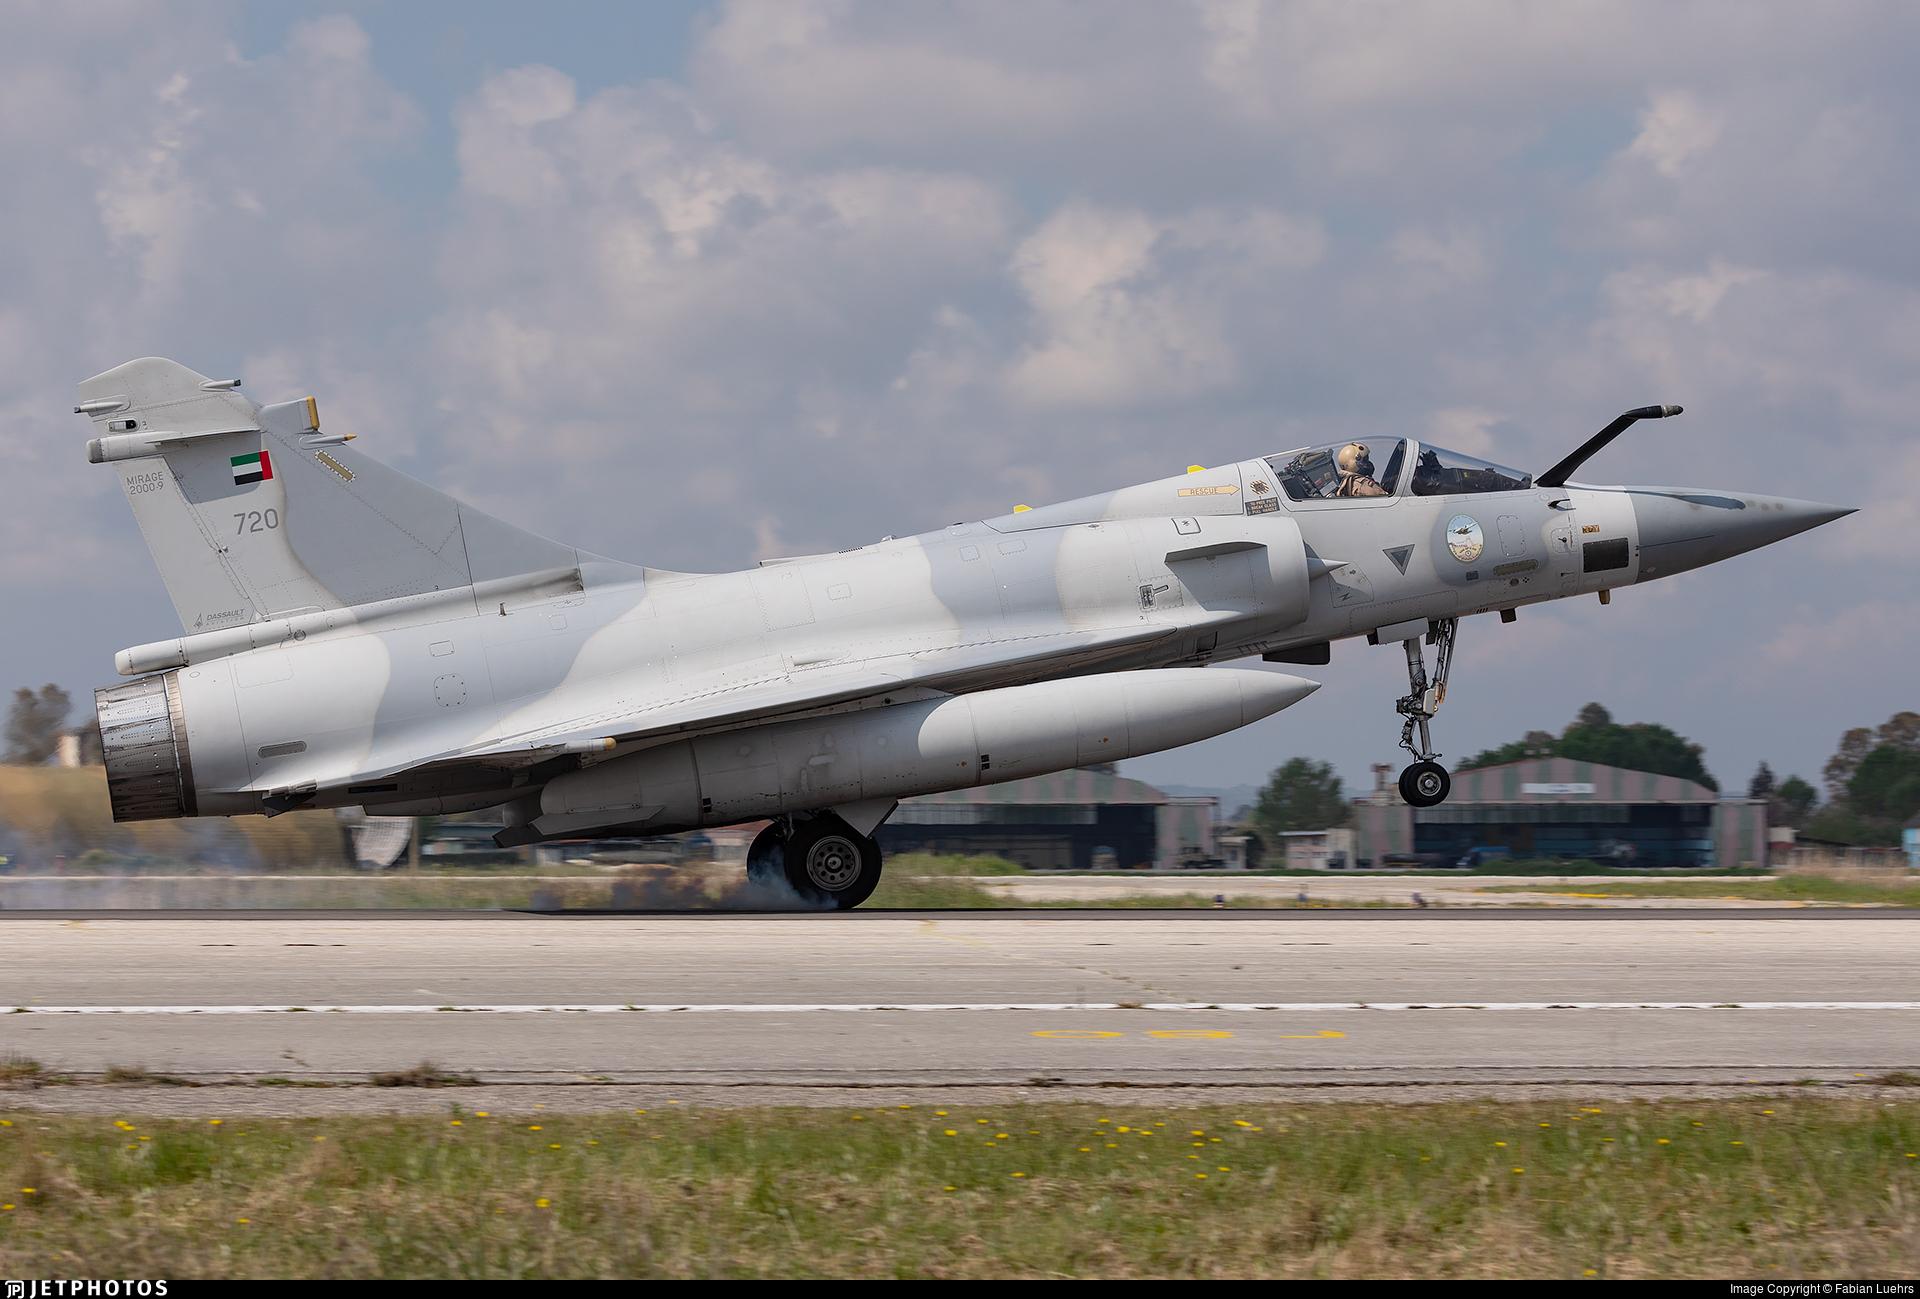 720 - Dassault Mirage 2000-9 - United Arab Emirates - Air Force